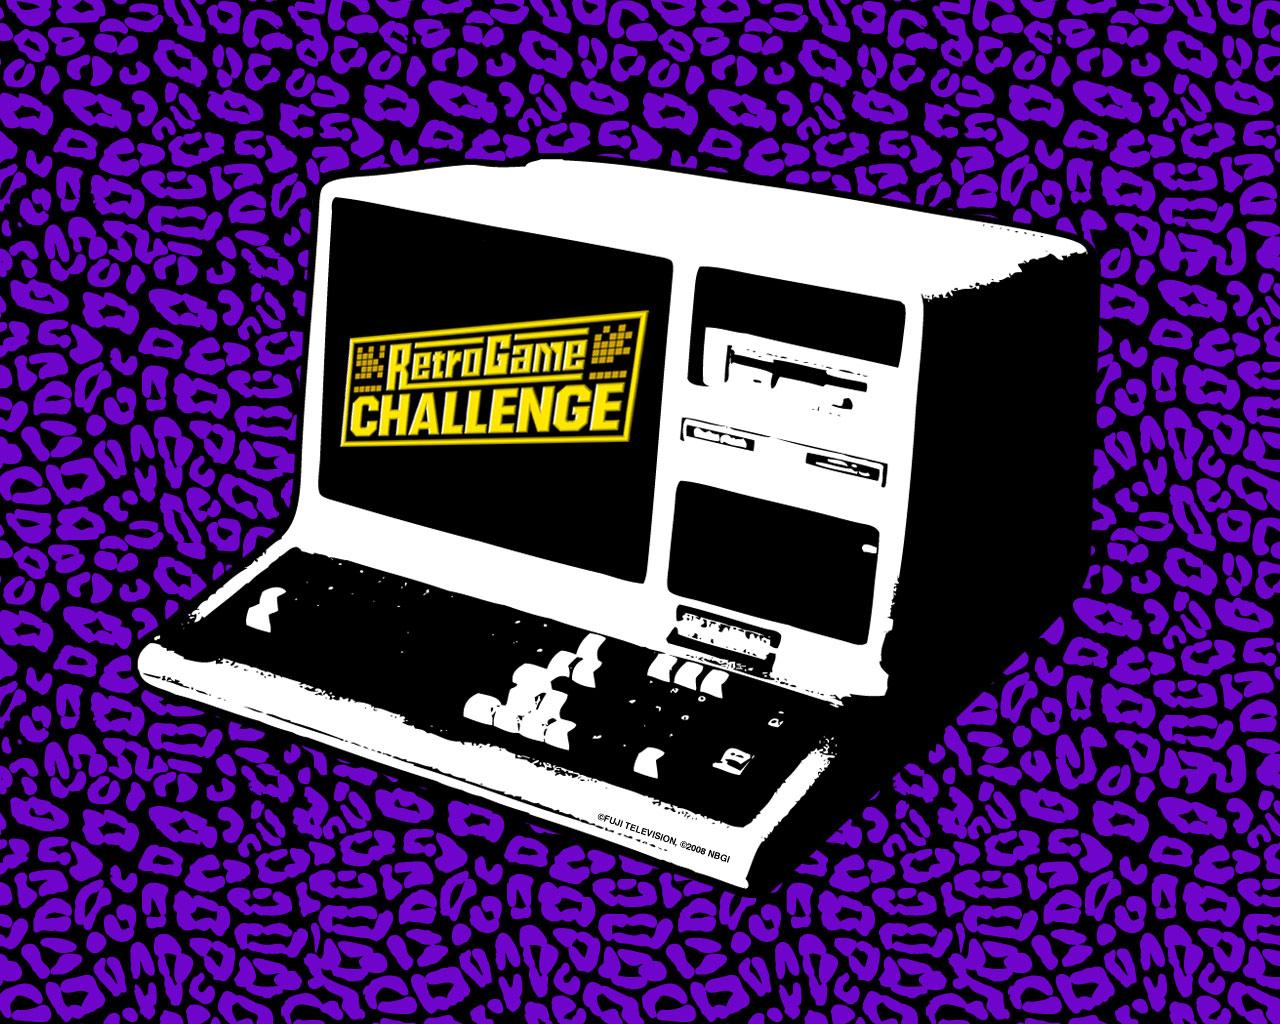 Retro Game Challenge Wallpaper Download Original Retro